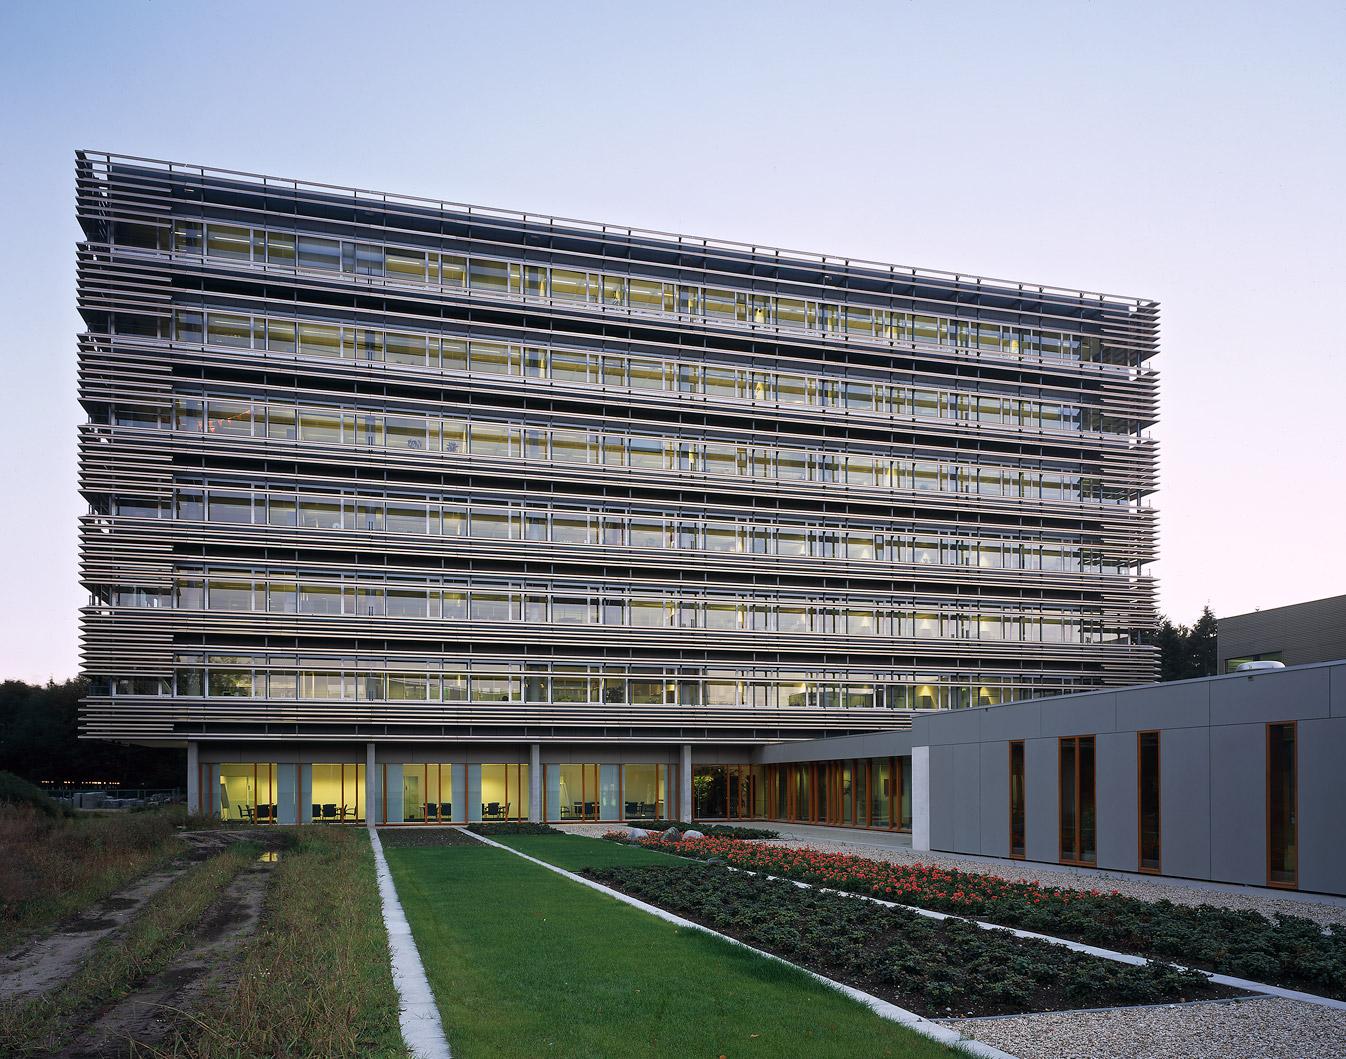 Belastingdienst Kantoor Rotterdam : Belasting douane museum u rotterdam